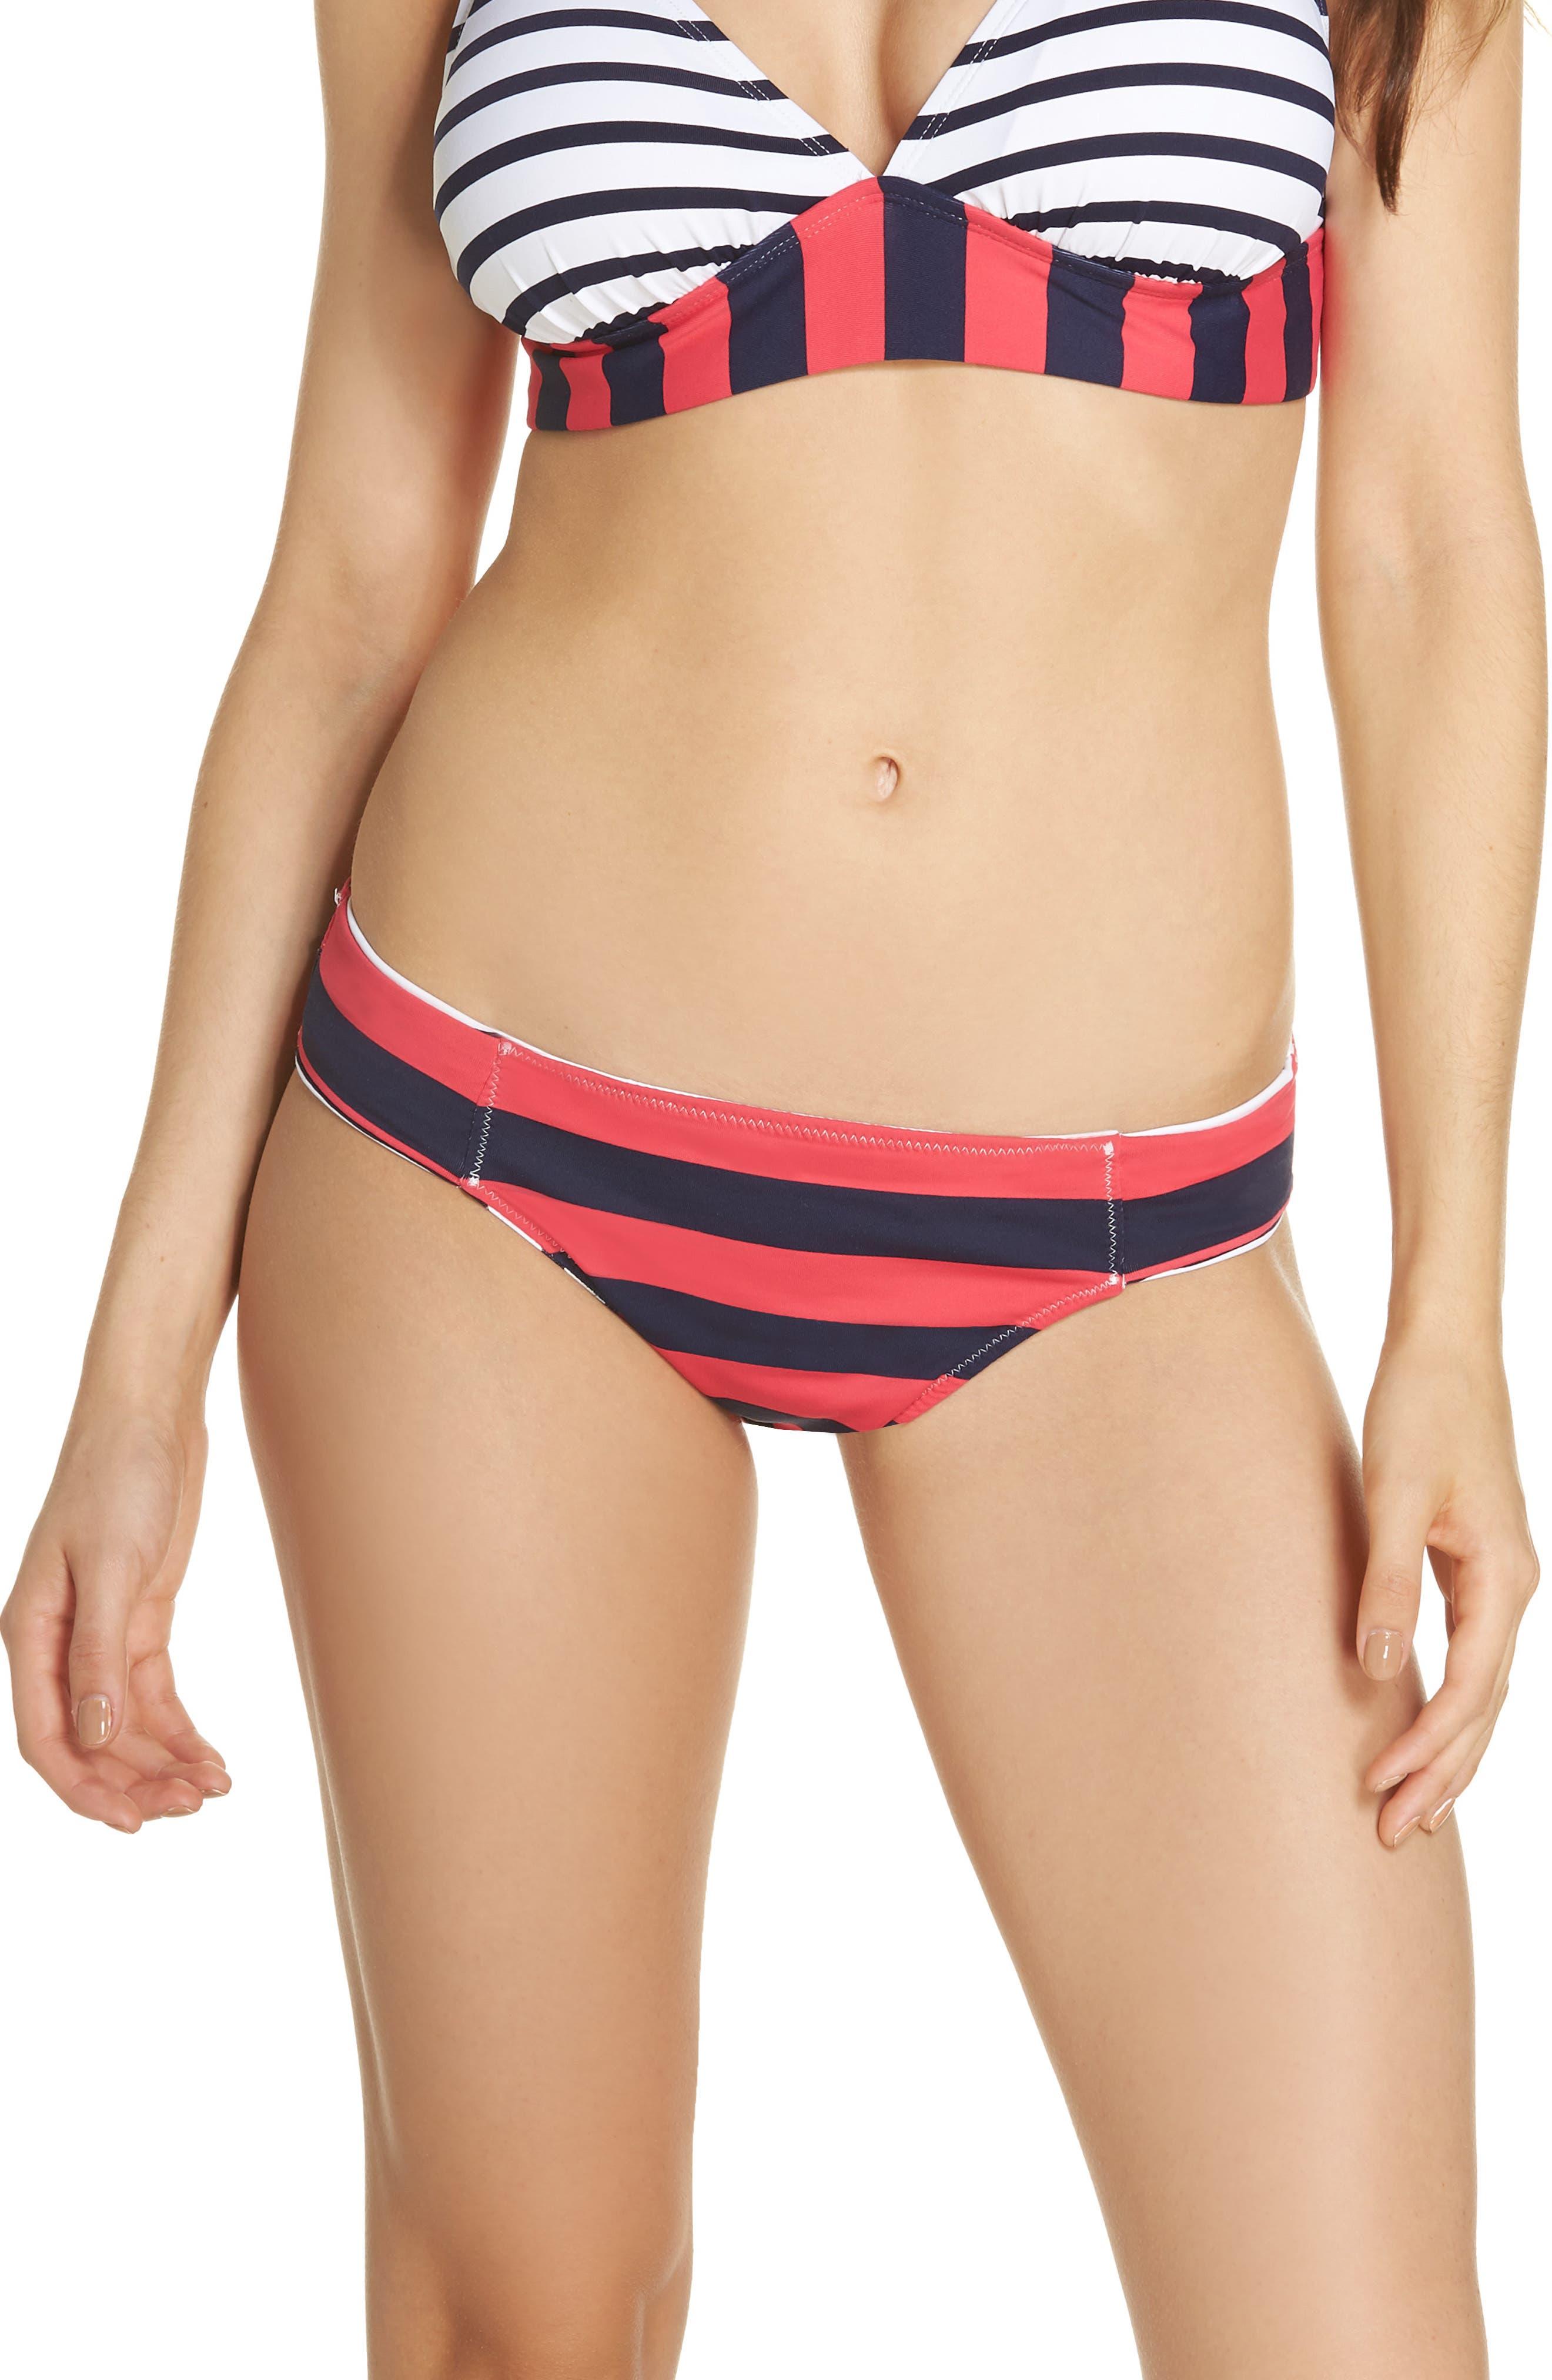 Channel Surfing Reversible Hipster Bikini Bottoms,                             Alternate thumbnail 2, color,                             Mare Blue